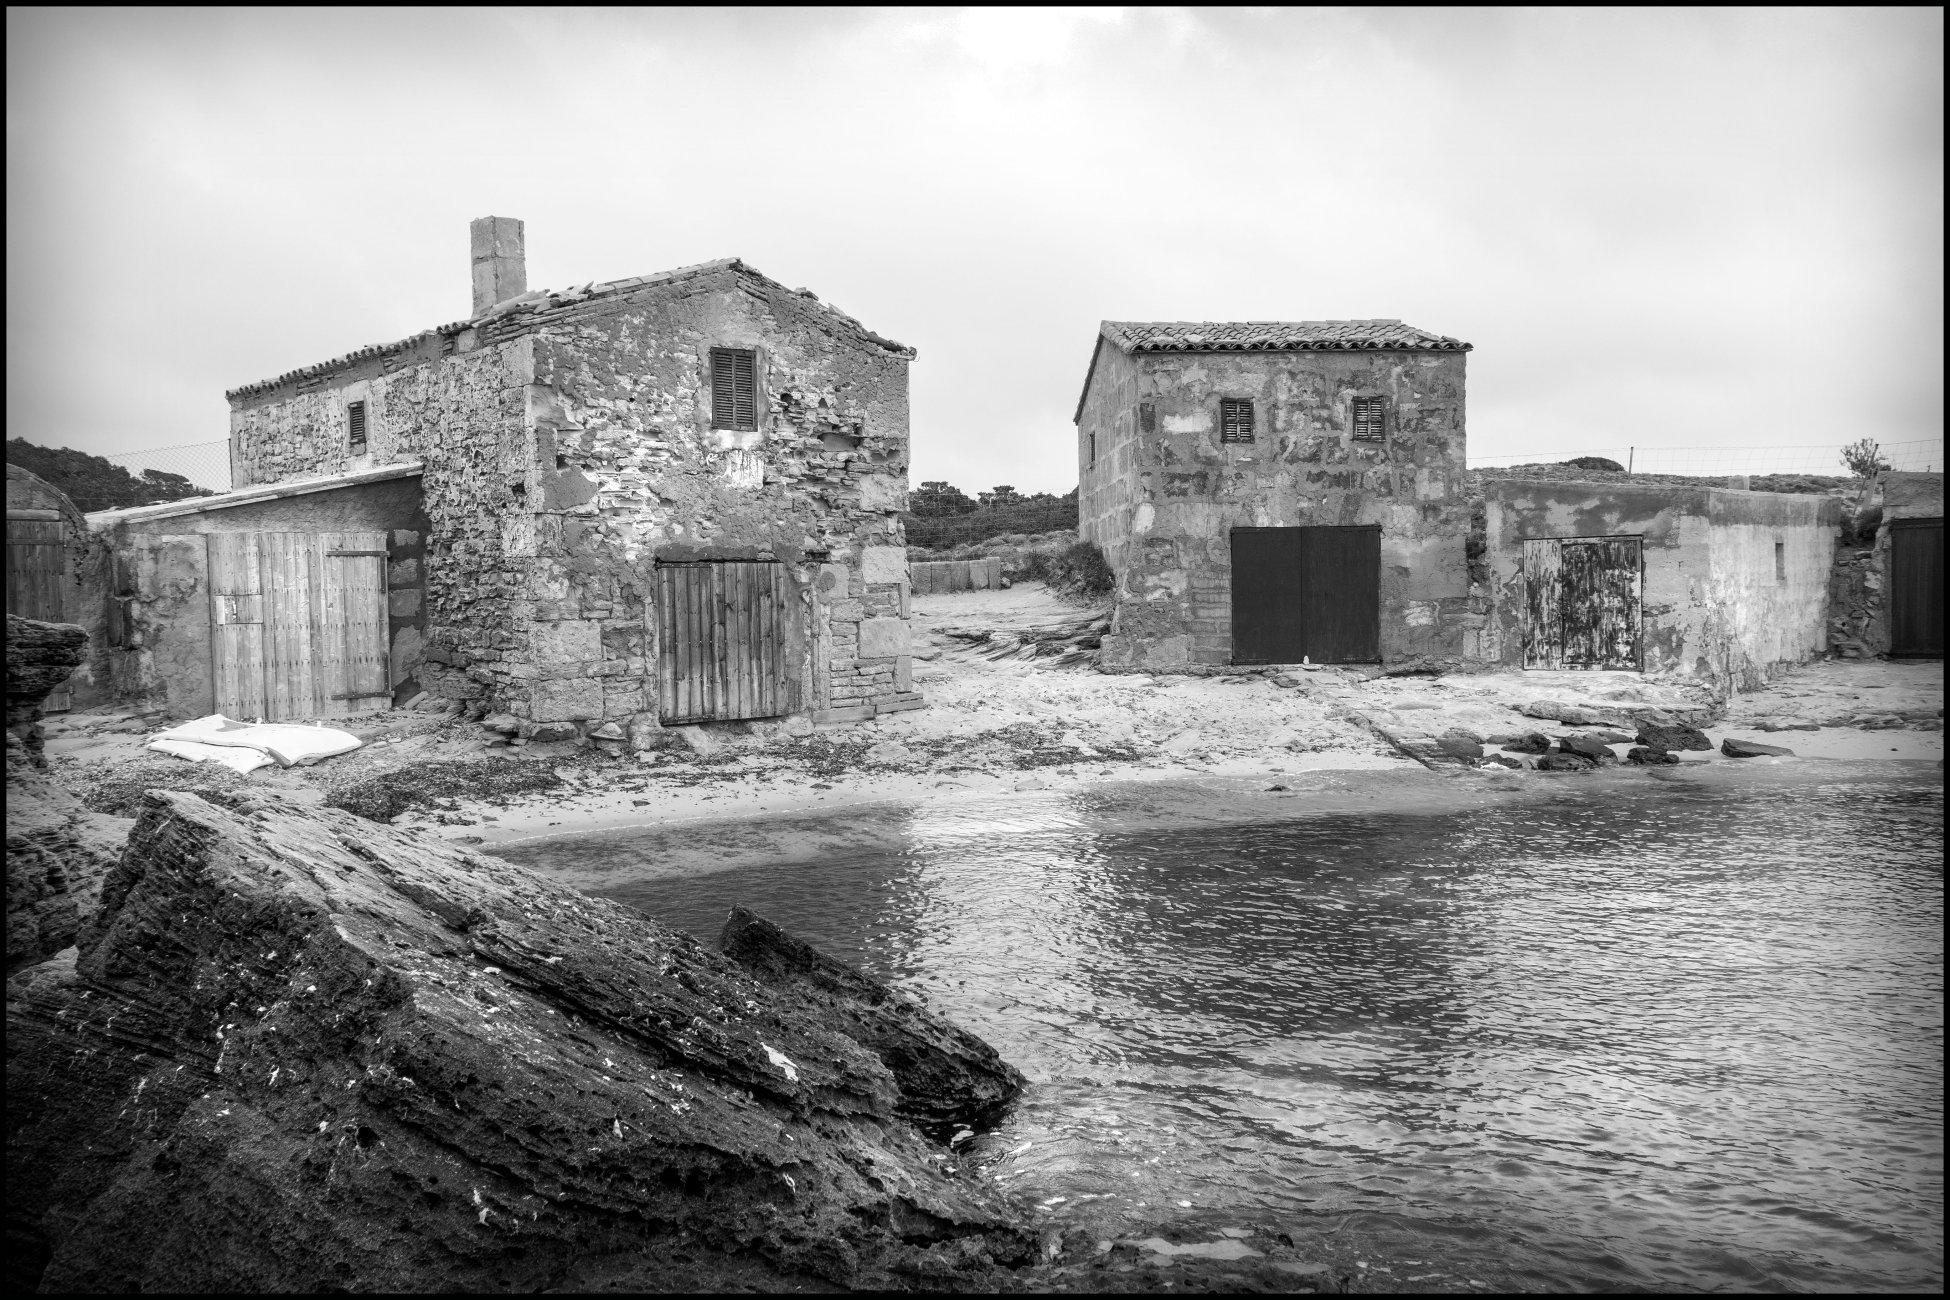 Fishermen's Huts, Colonia St.Jordi